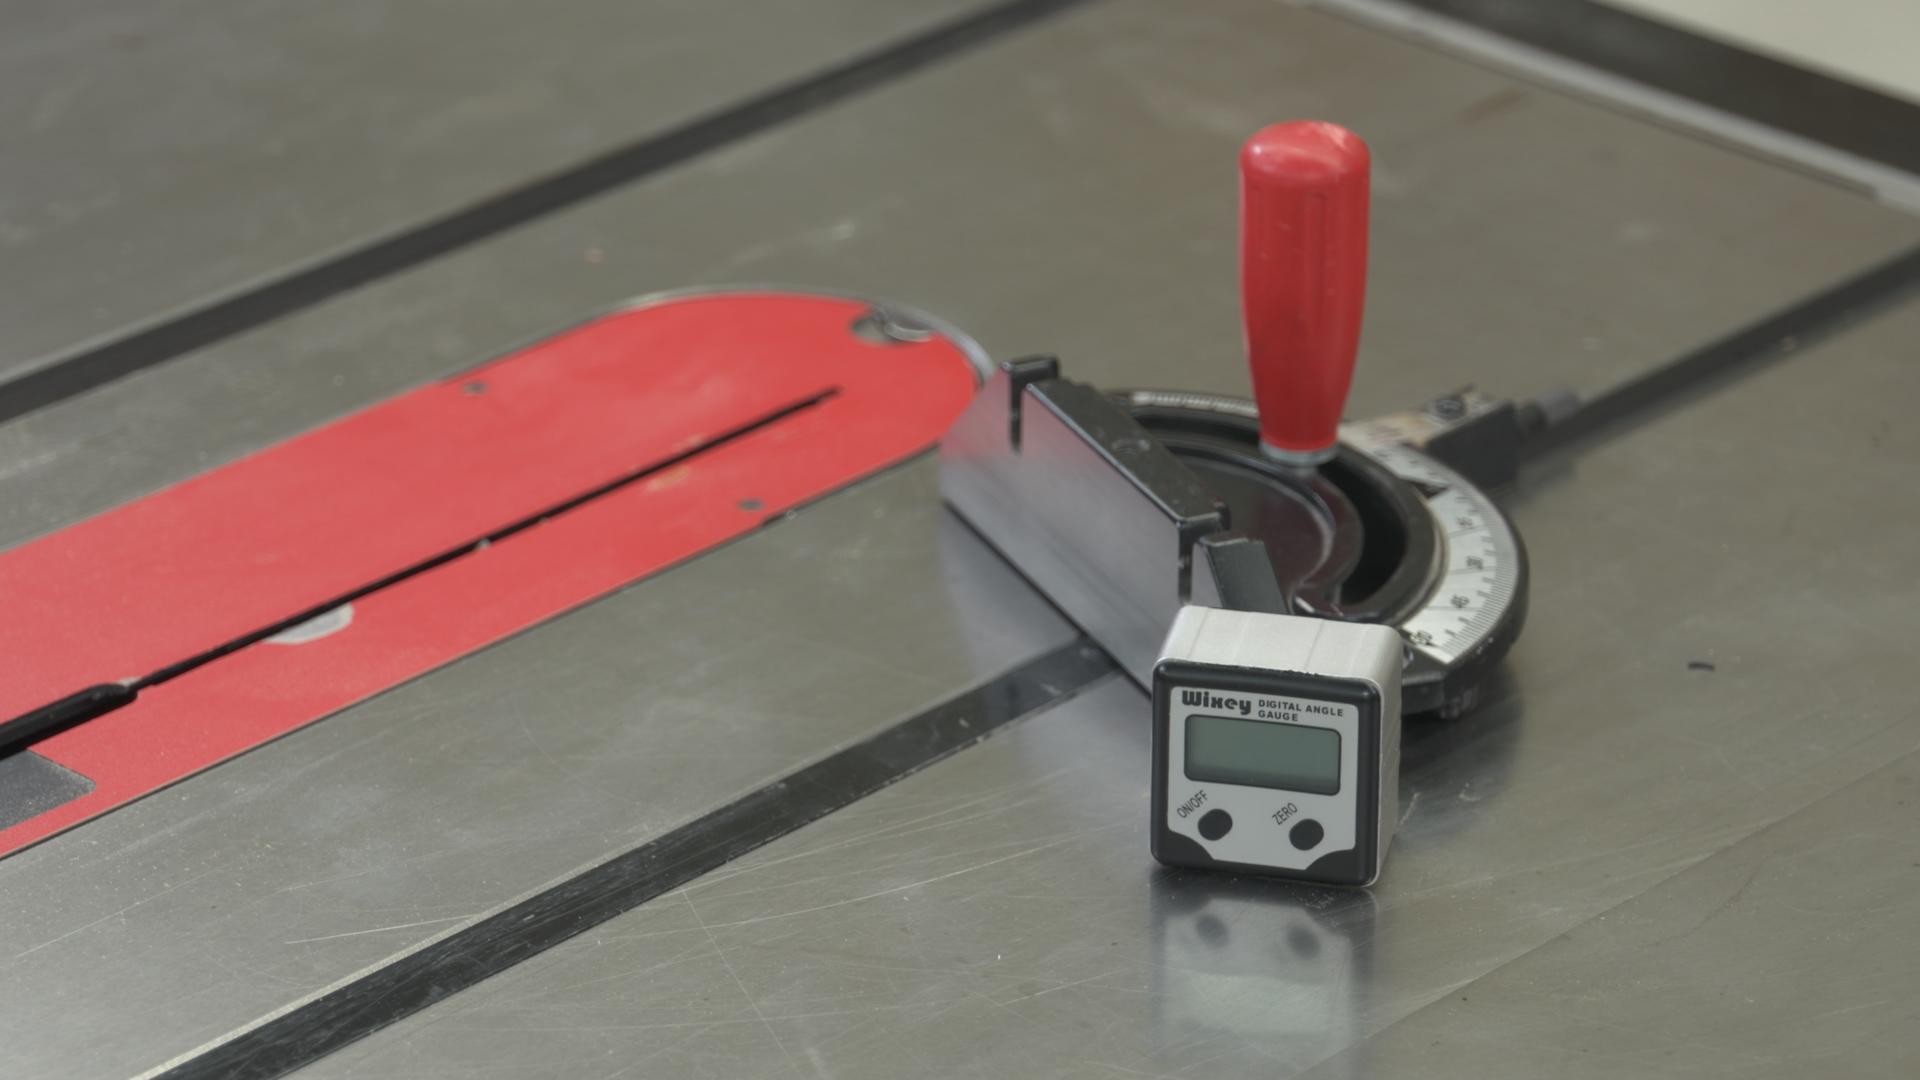 Using A Digital Angle Gauge To Set Table Saw Miter Gauge